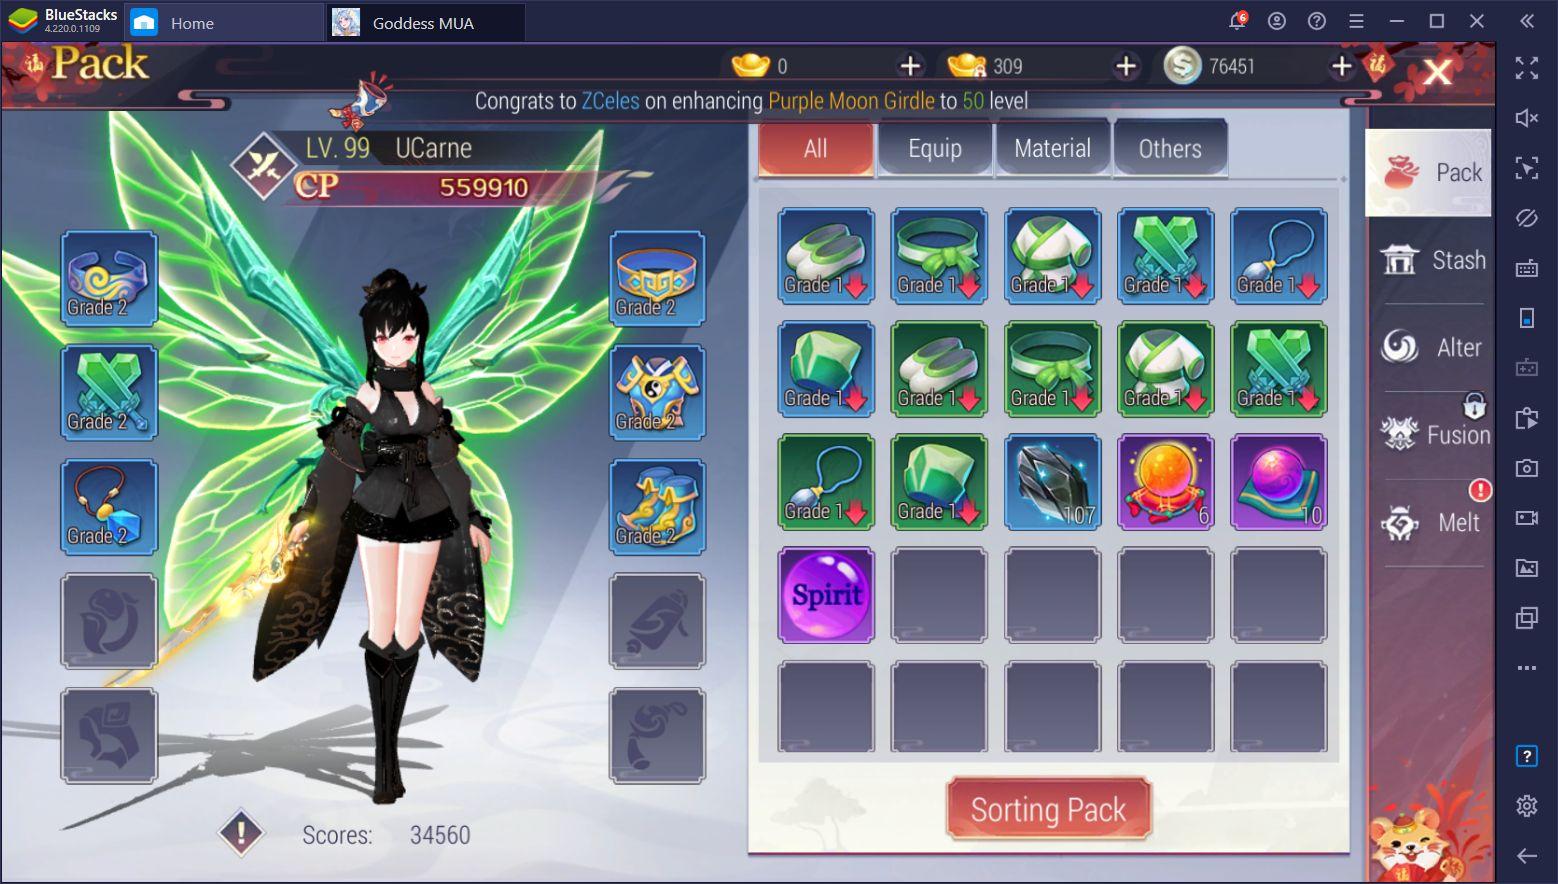 Goddess MUA – Beginner's Guide for Upgrading Your Goddess and Character